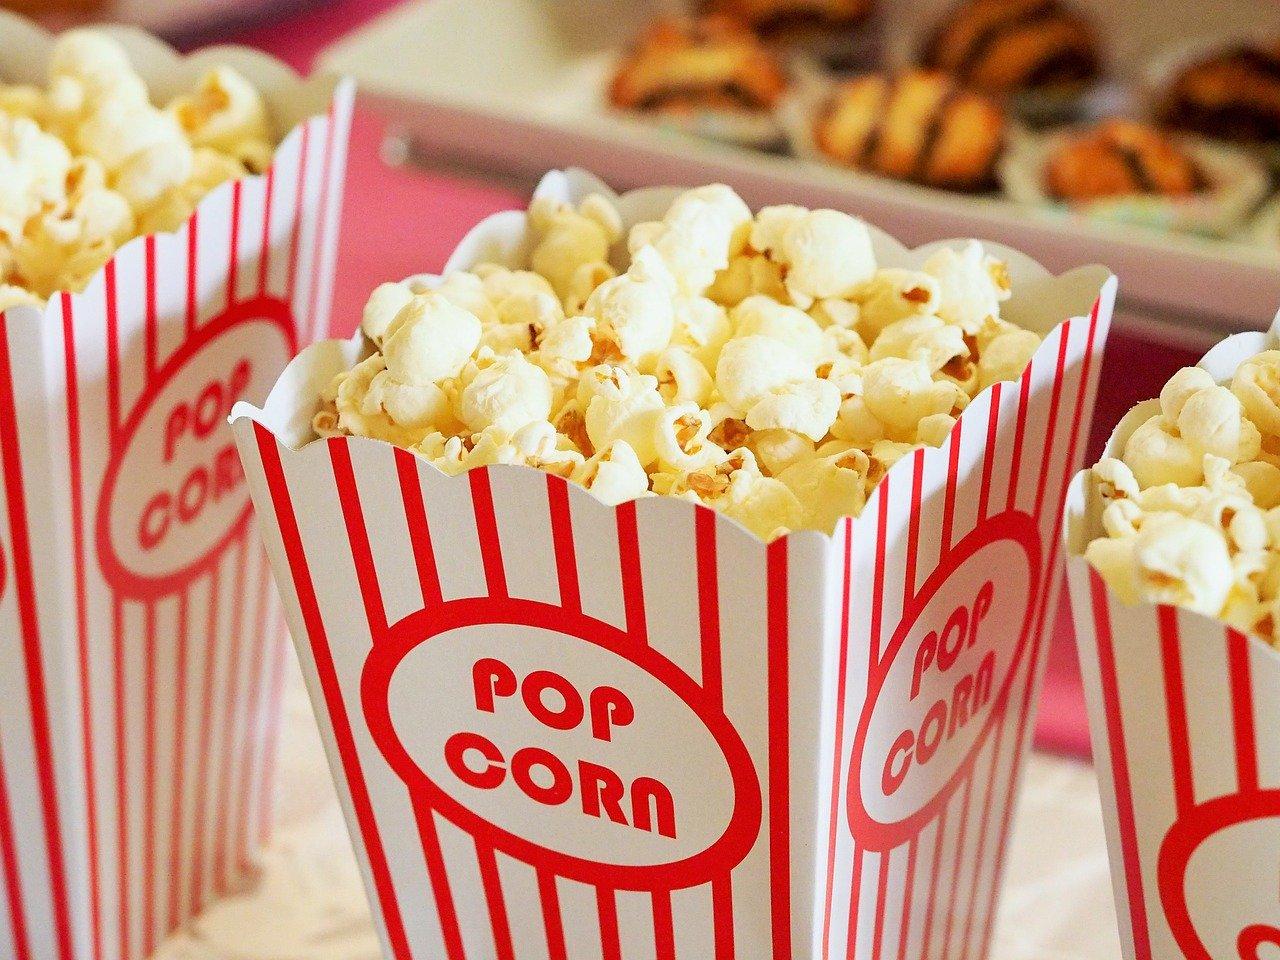 popcorn-online-entertinment